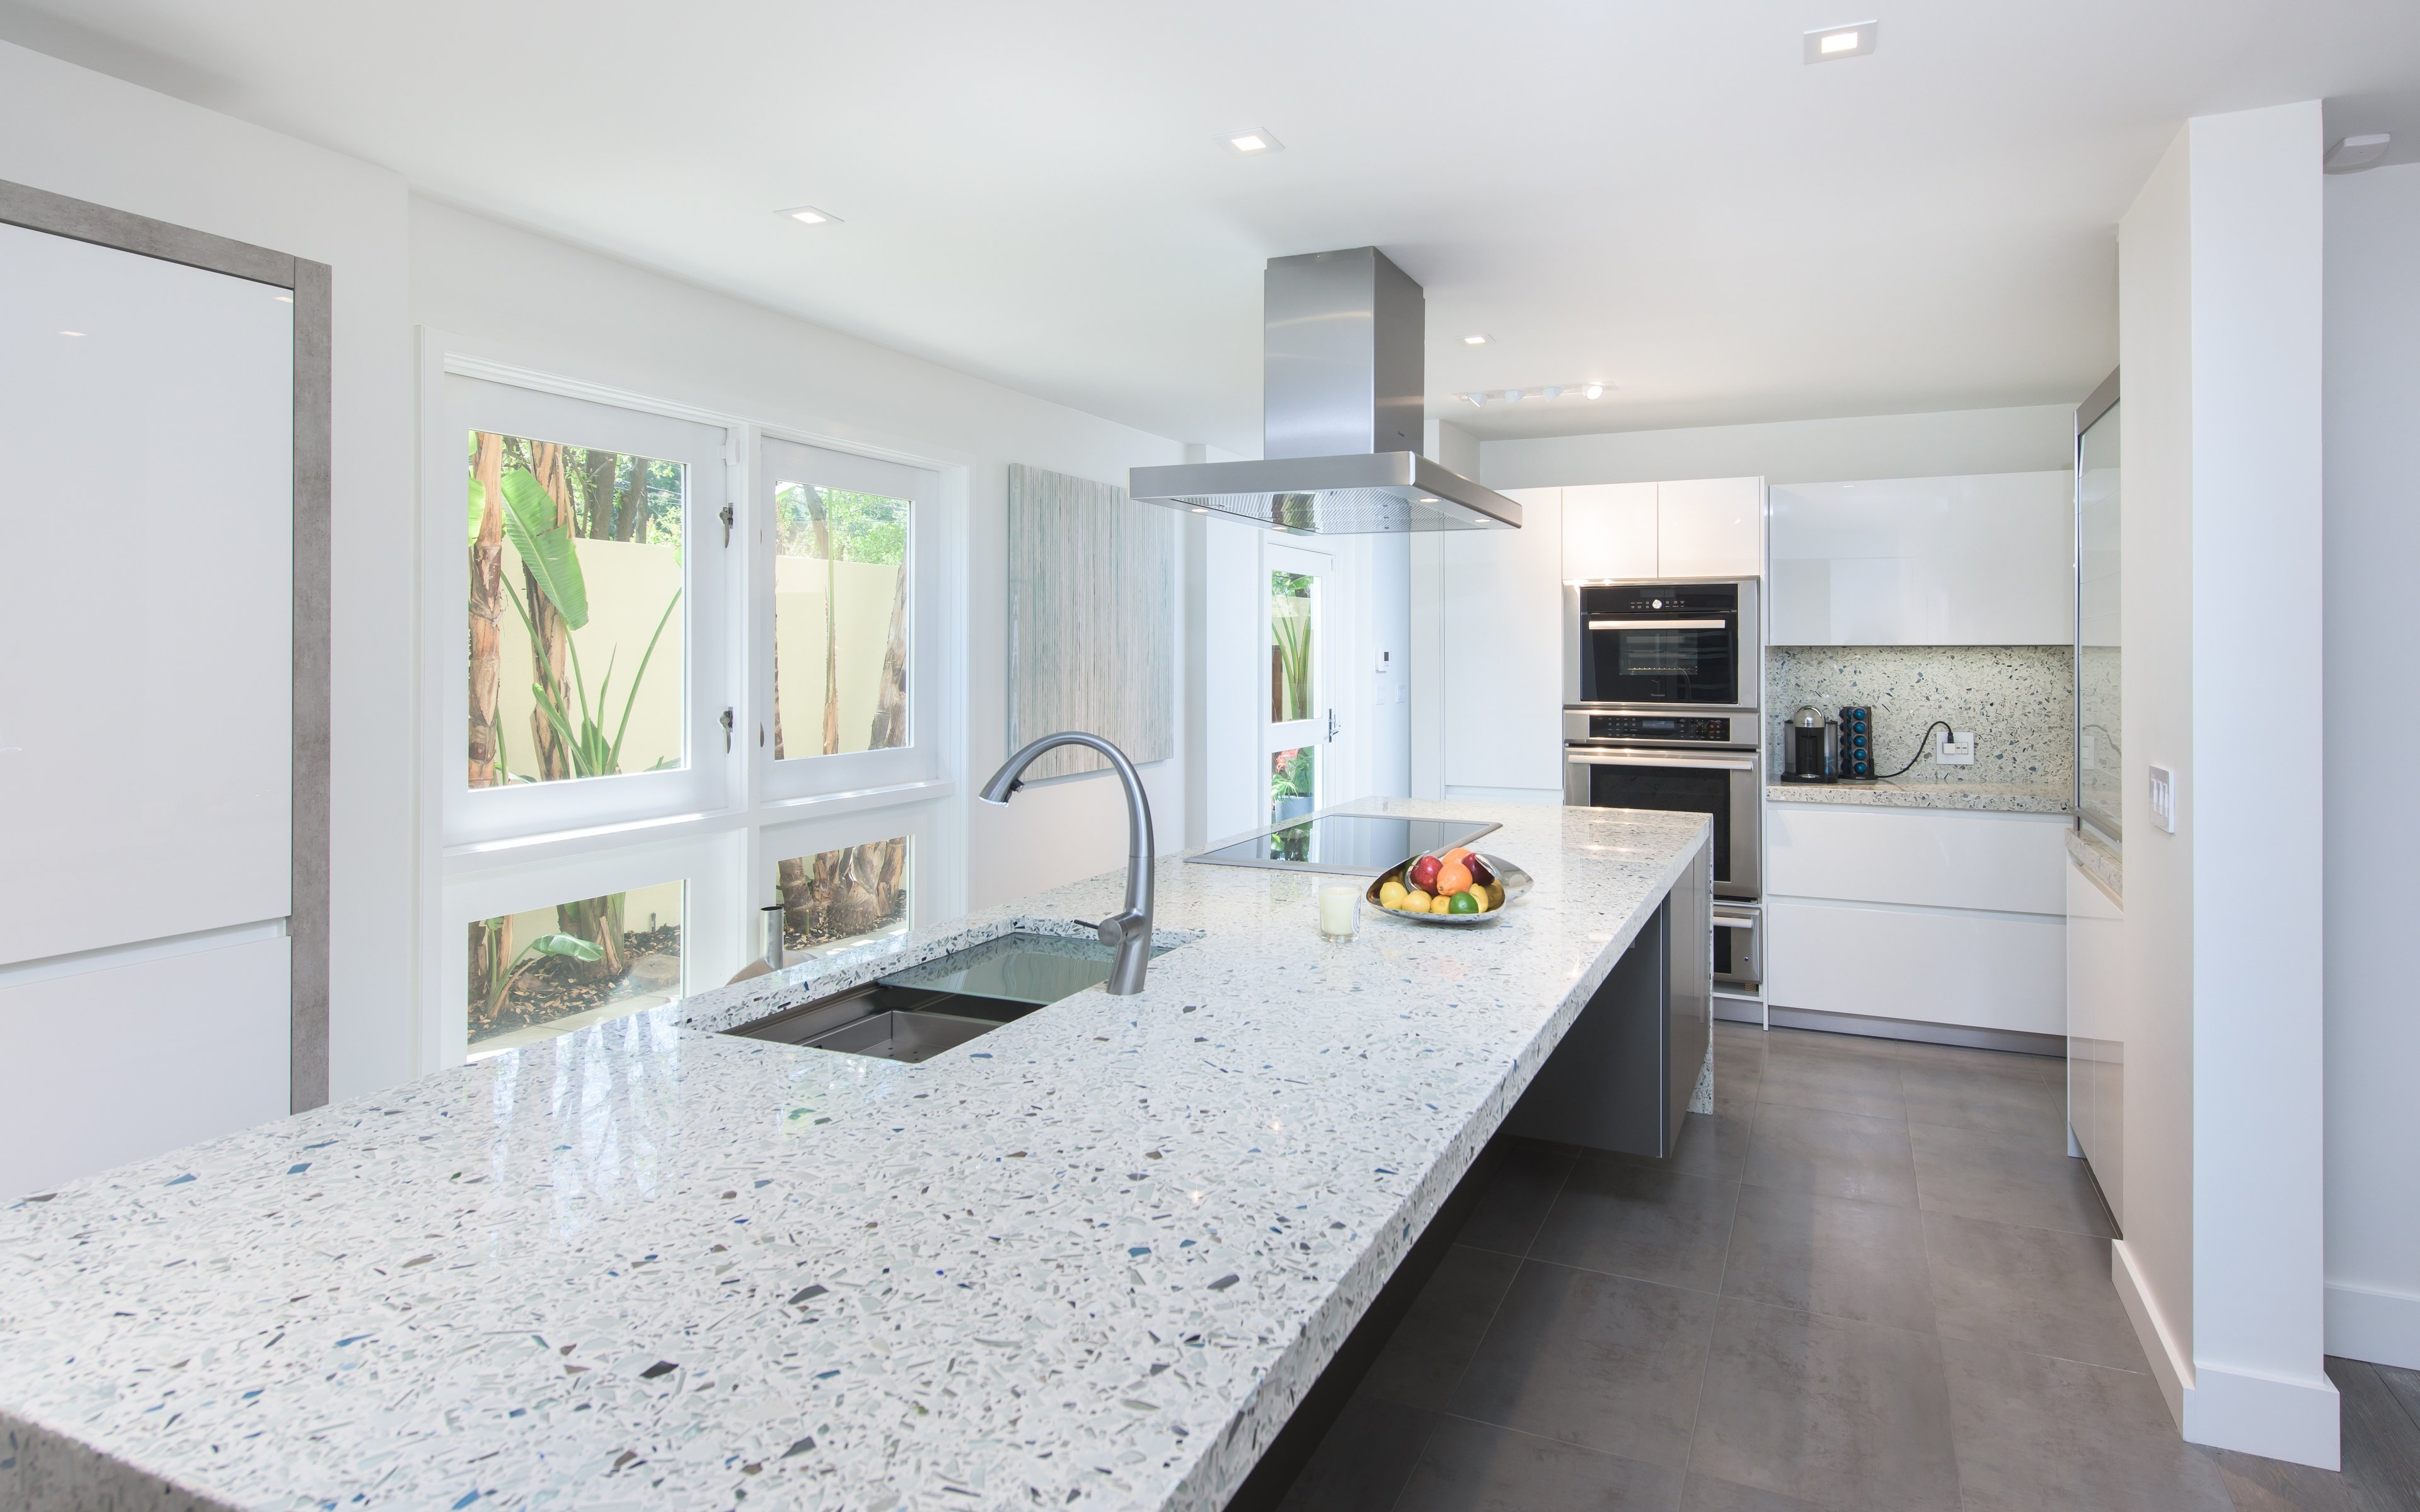 Ana-Barbara-modern-Kitchen-bauformat-vetrazzo-recycled-glass-4